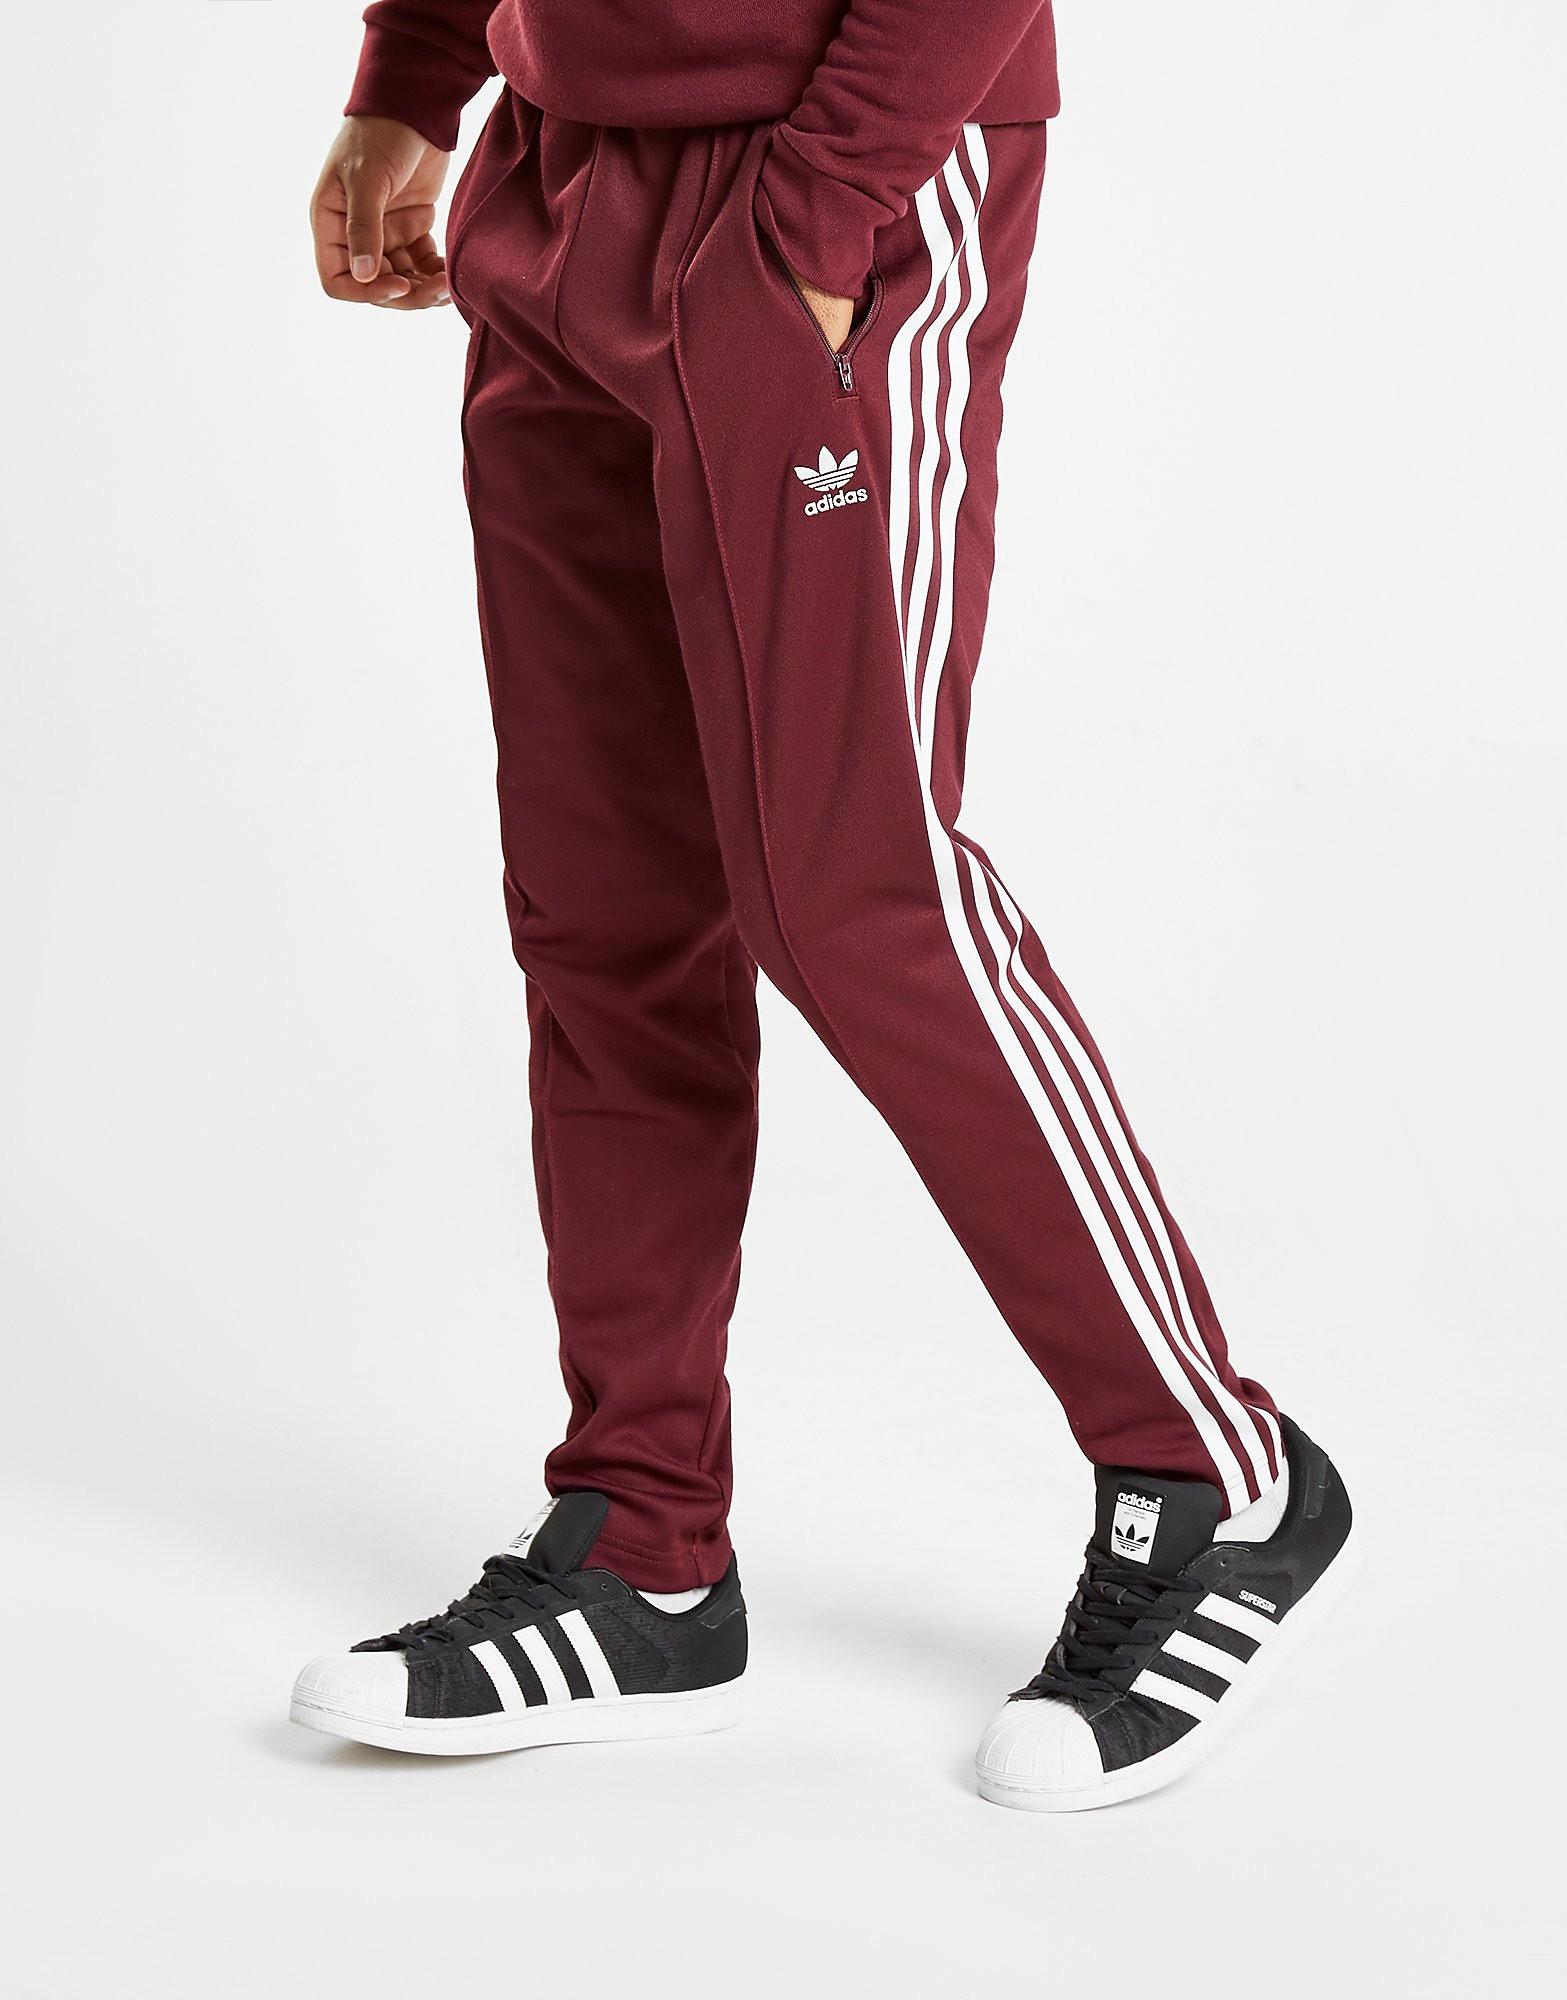 adidas Originals Beckenbauer Cuffed Track Pants Heren - Maroon/White - Heren